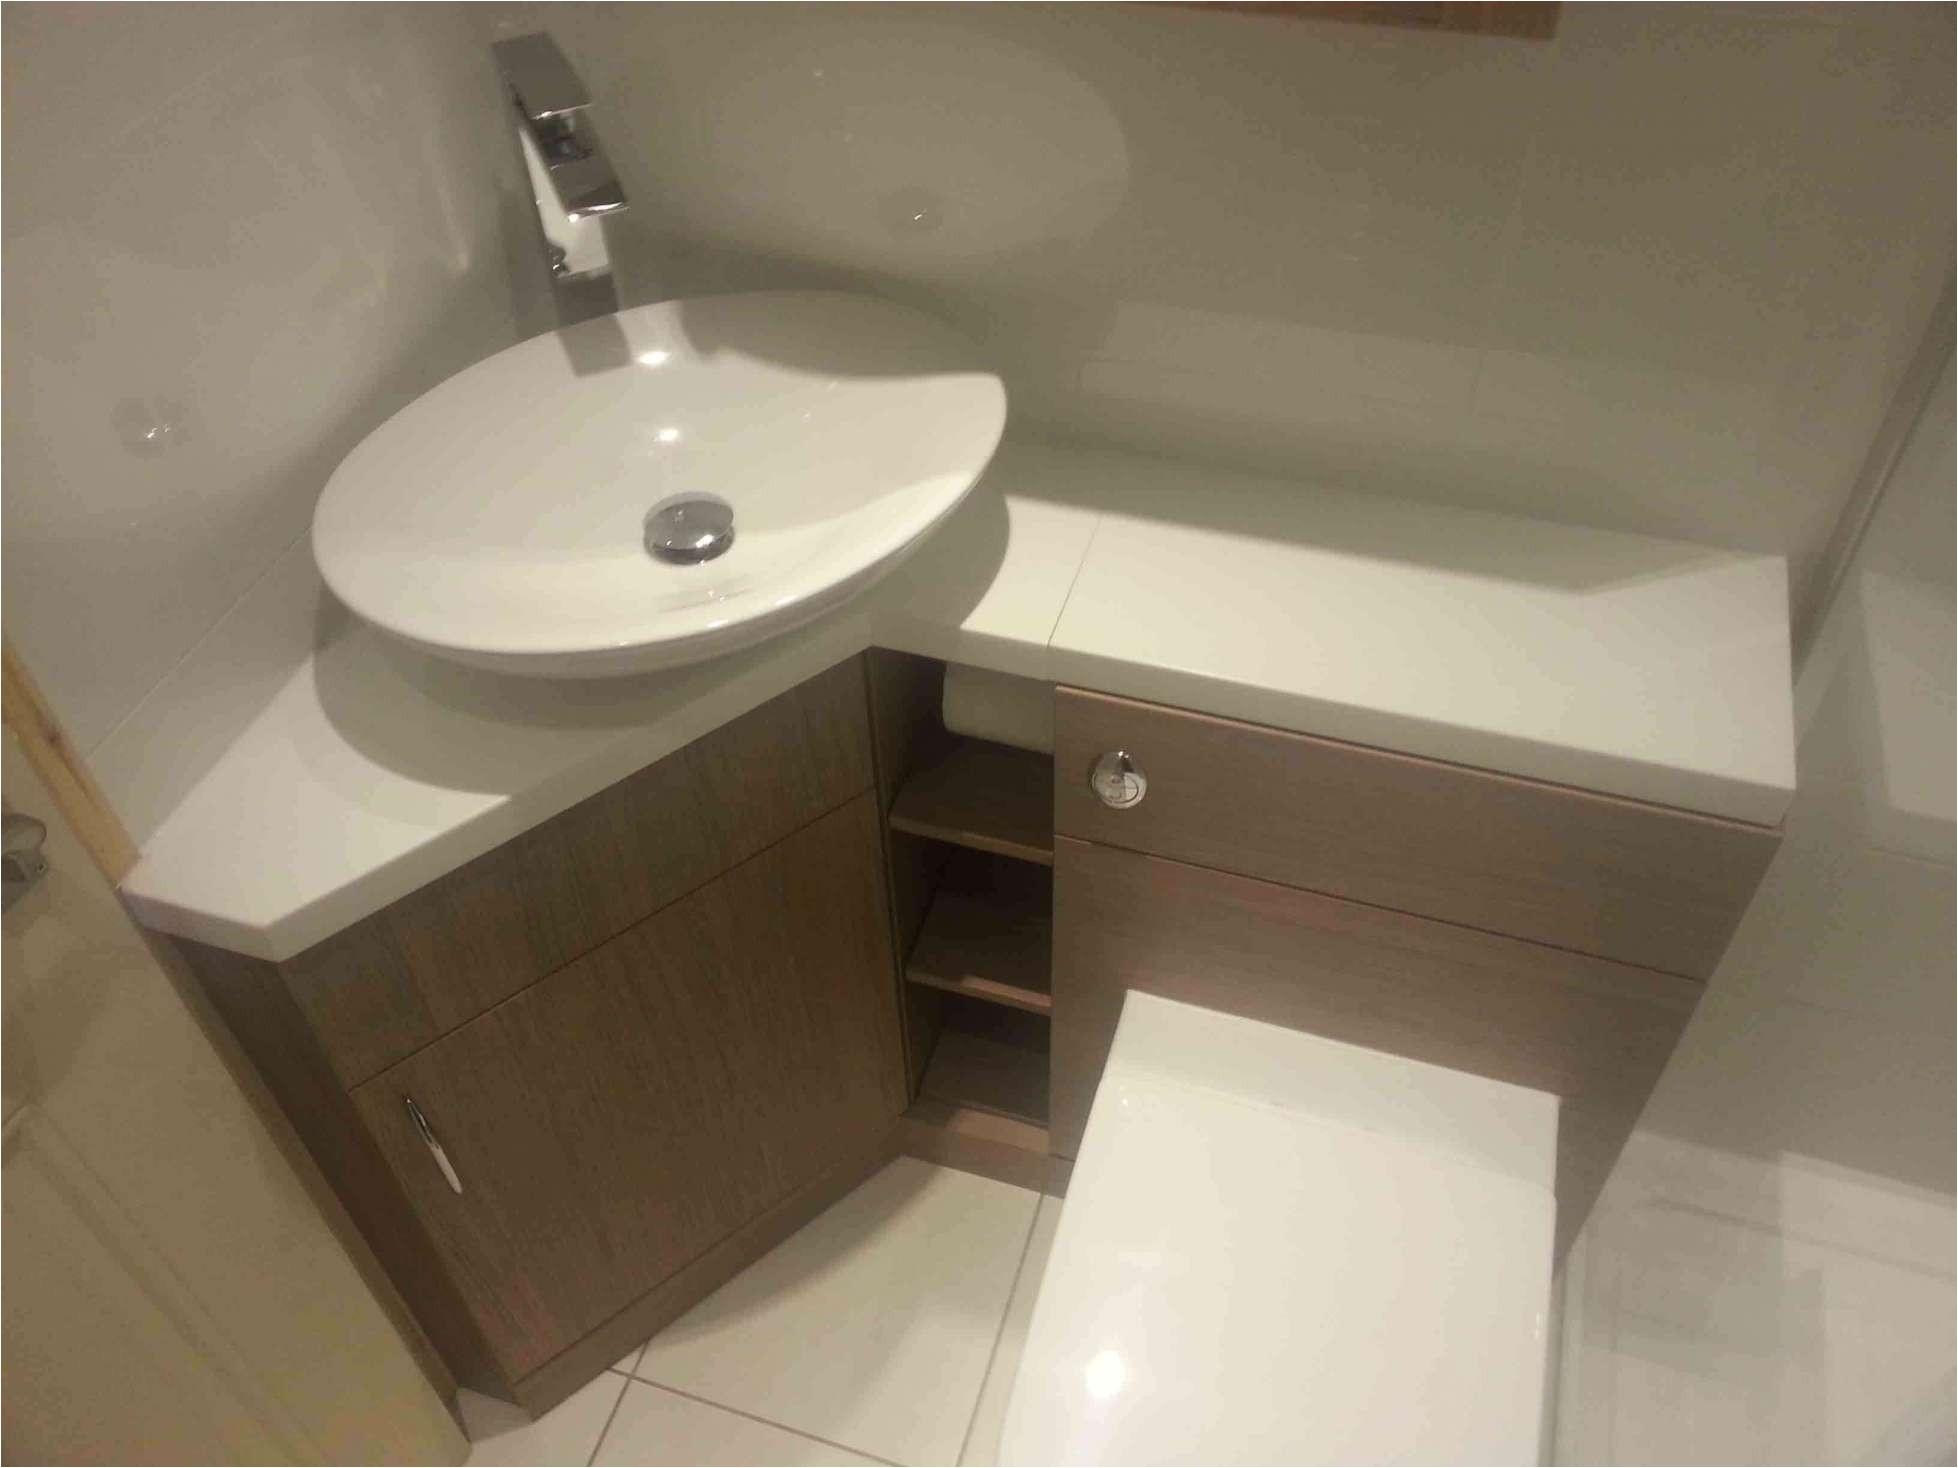 Gray and Brown Bathroom Elegant Bathroom Sink Design Ideas Lovely H Sink Install Bathroom I 0d Ideas